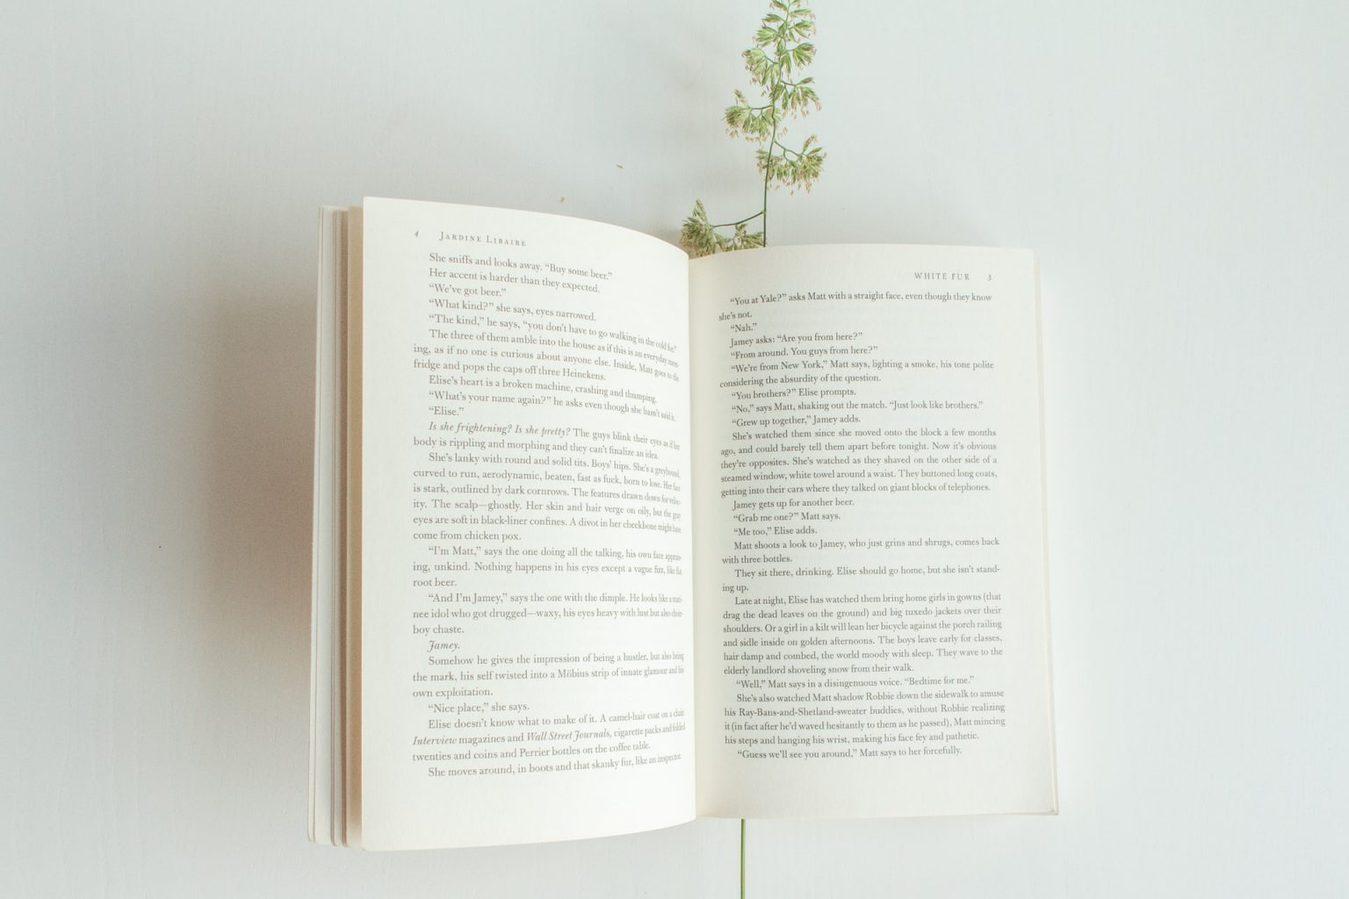 Libro aperto su un tavolo bianco